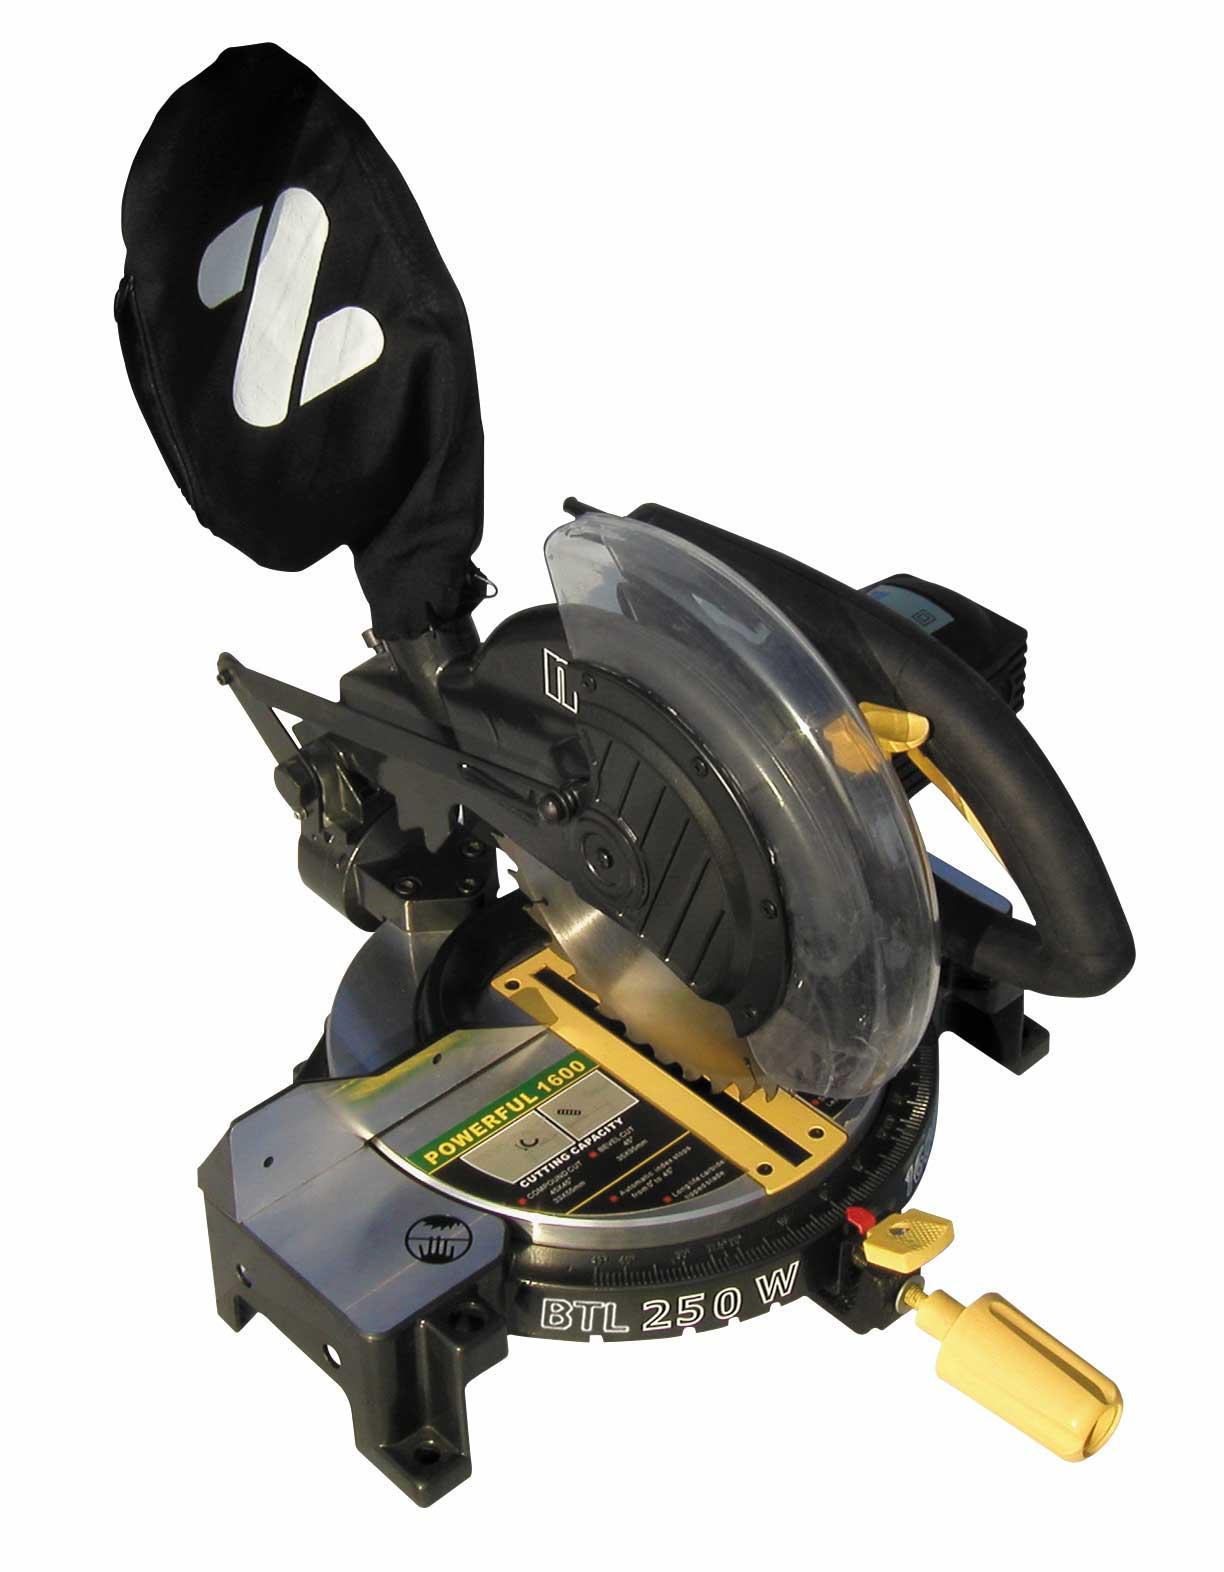 NUAIR BTL250 Pila ukosowa NUTOOL 250mm1800W z laserem